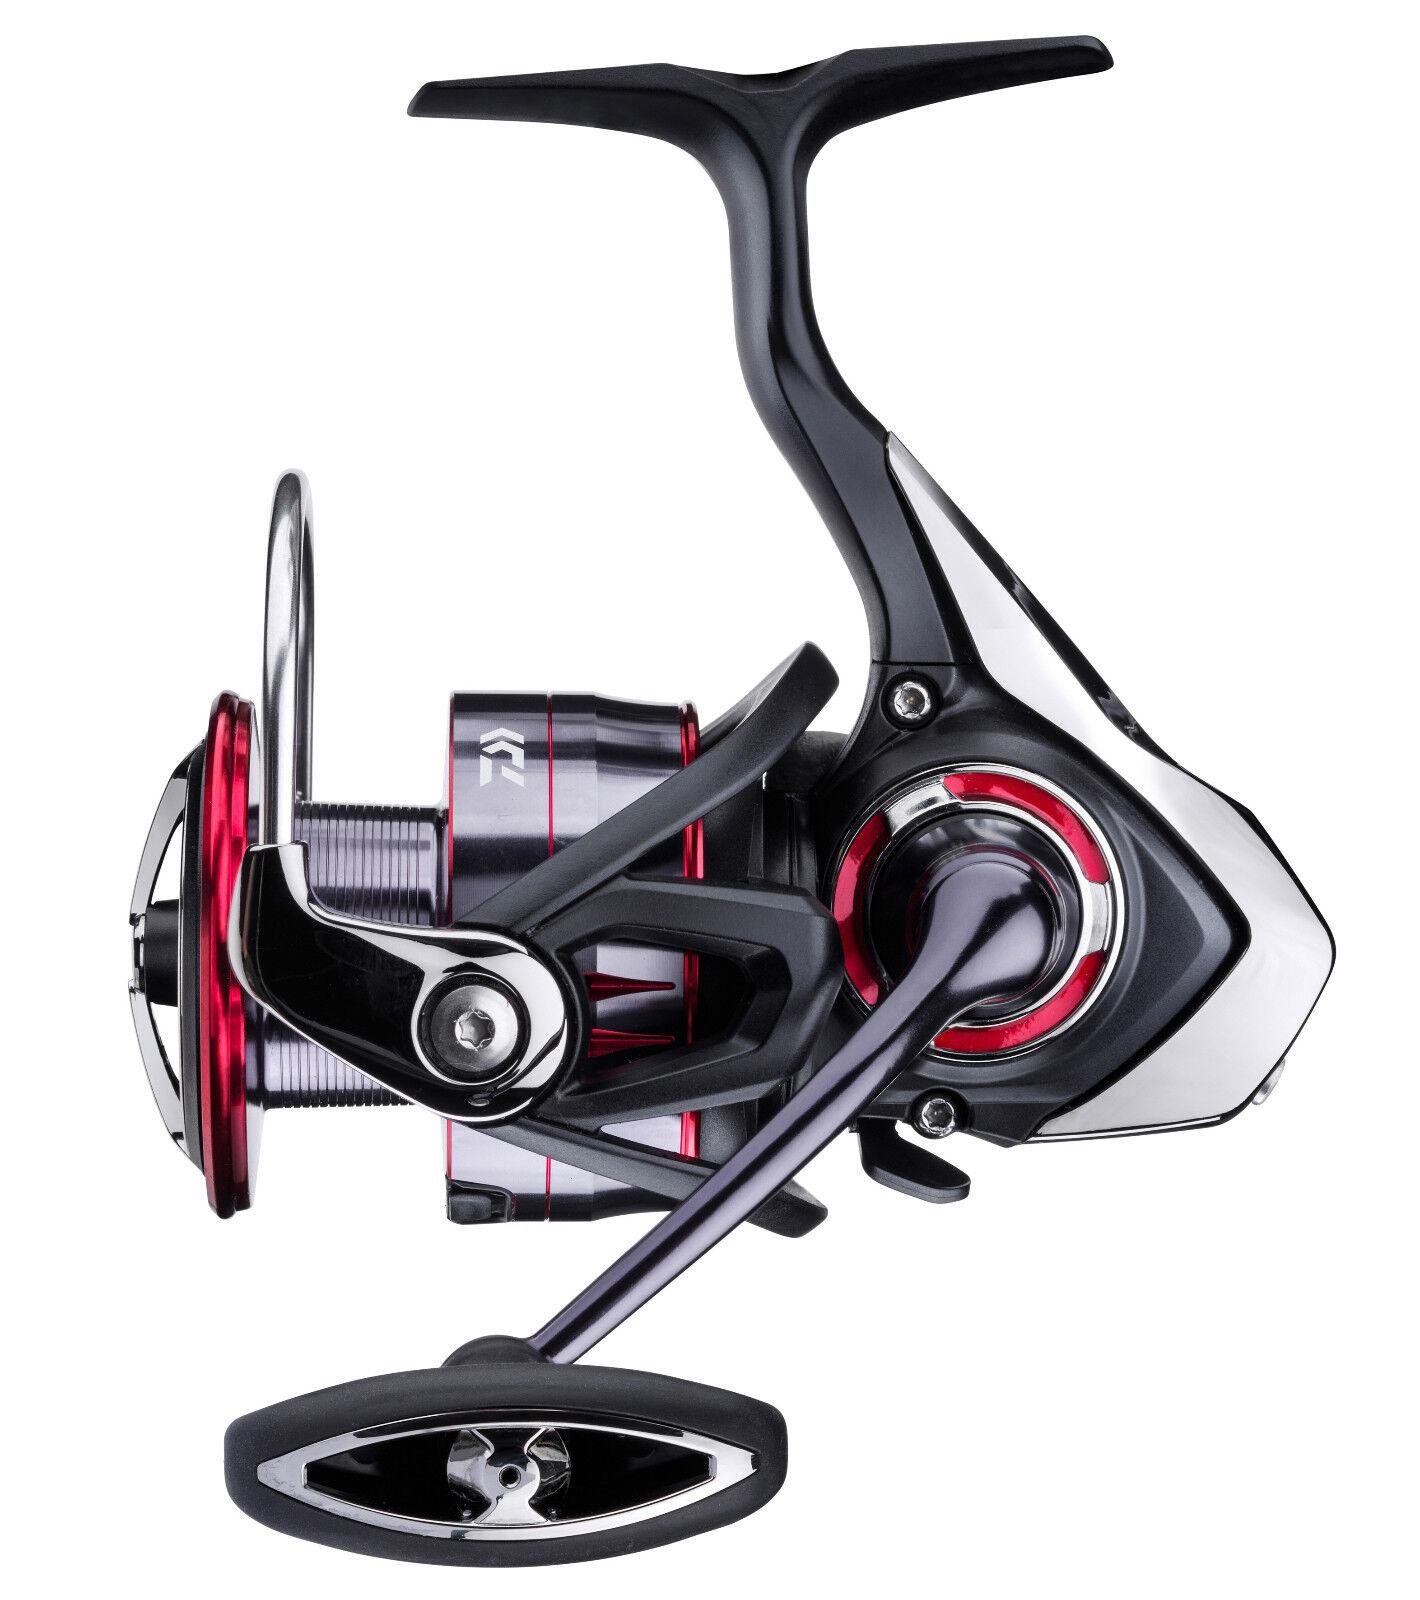 Daiwa Fuego LT Spinnrolle Neuheit Frontbremse Mag Mag Frontbremse Sealed Spinning Angelrolle fa14c1